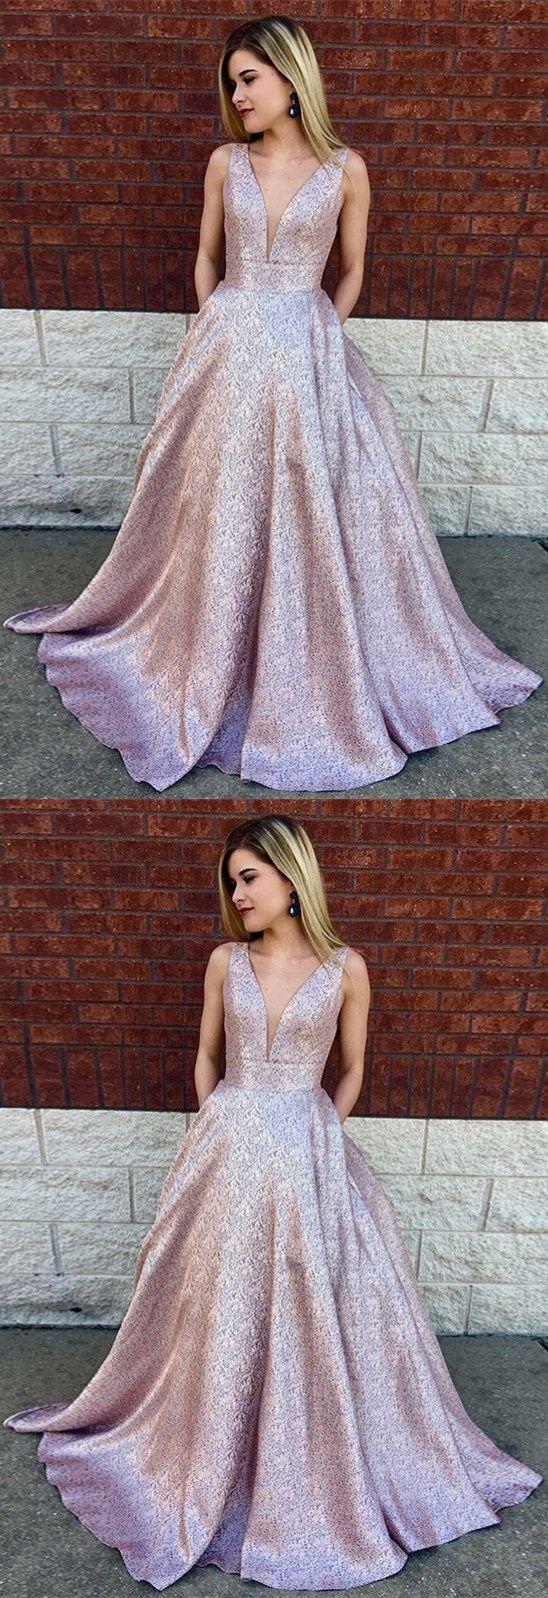 Deep vneck aline long lilac printed satin prom dress with pockets